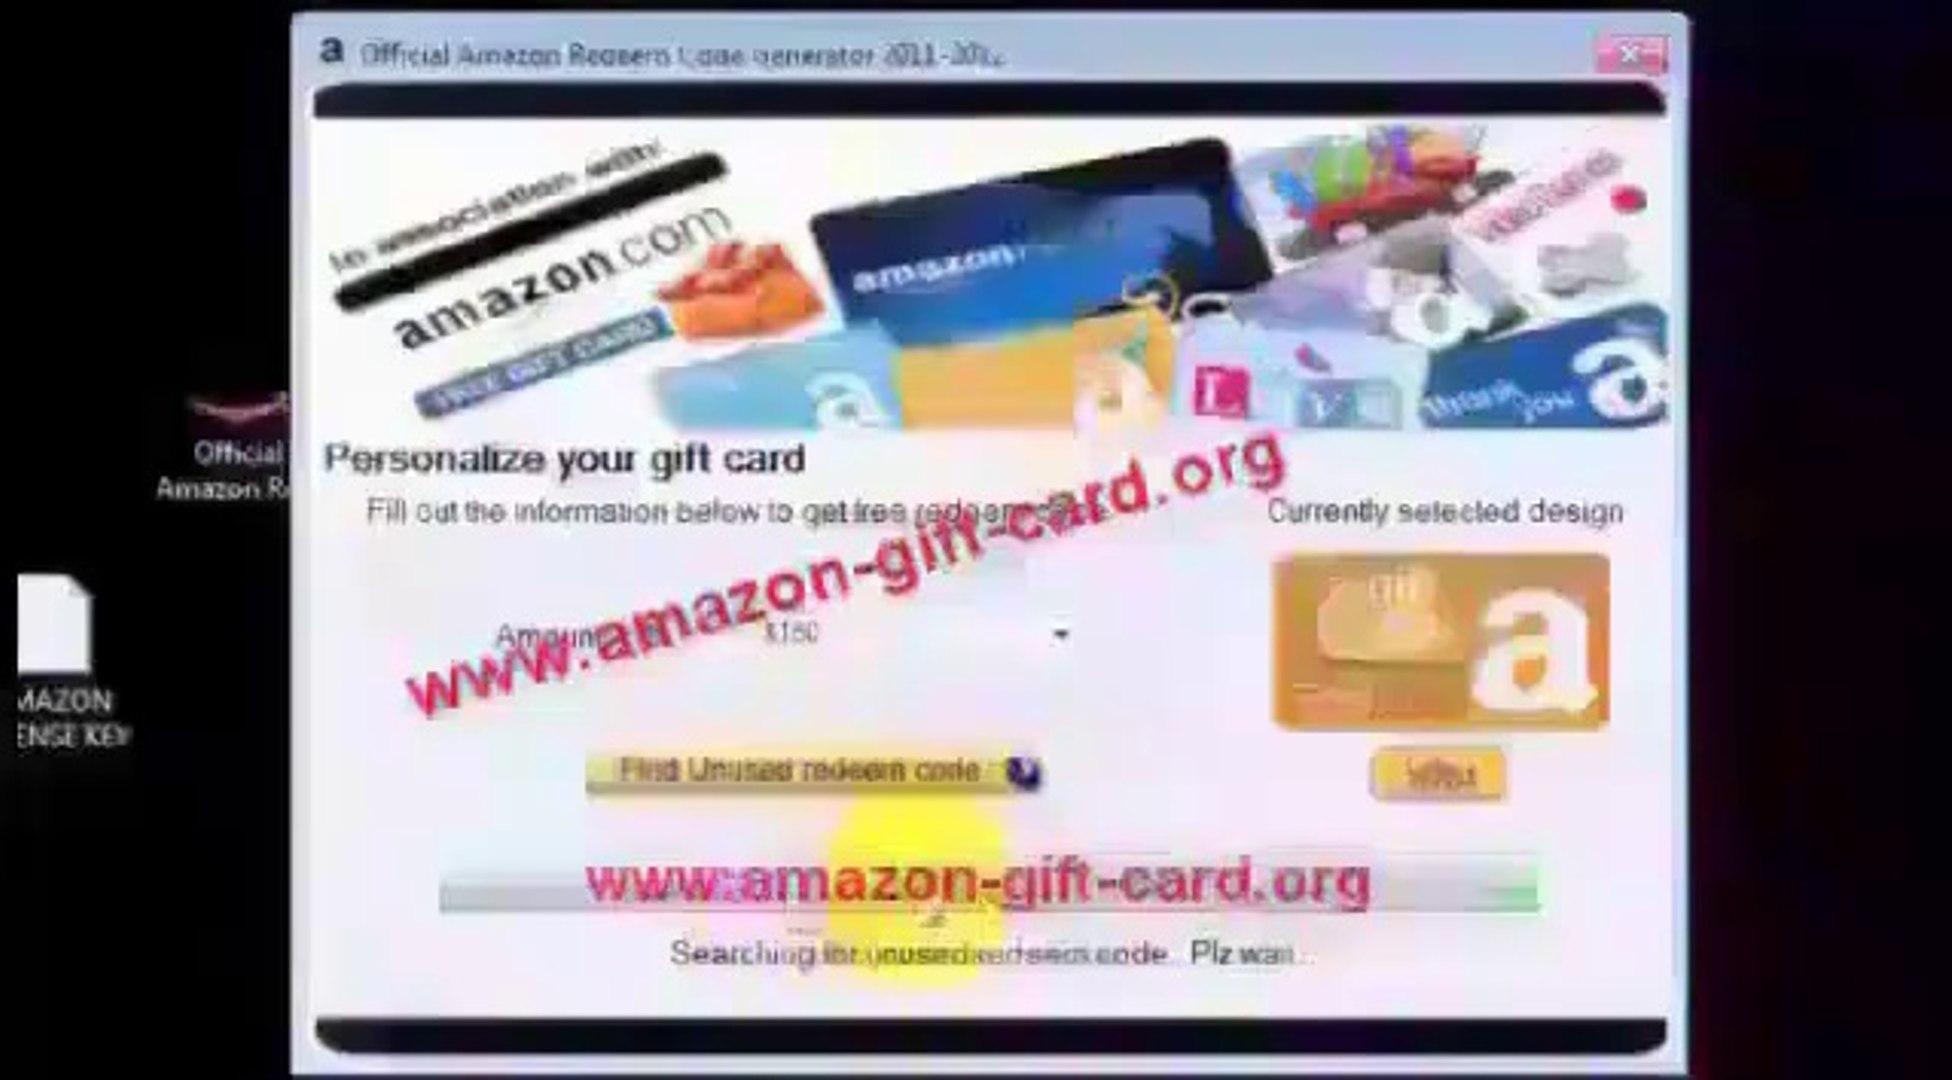 Amazon Card generator,Amazon Card codes,buy amazon gift Card,free amazon gift Card codes 2014